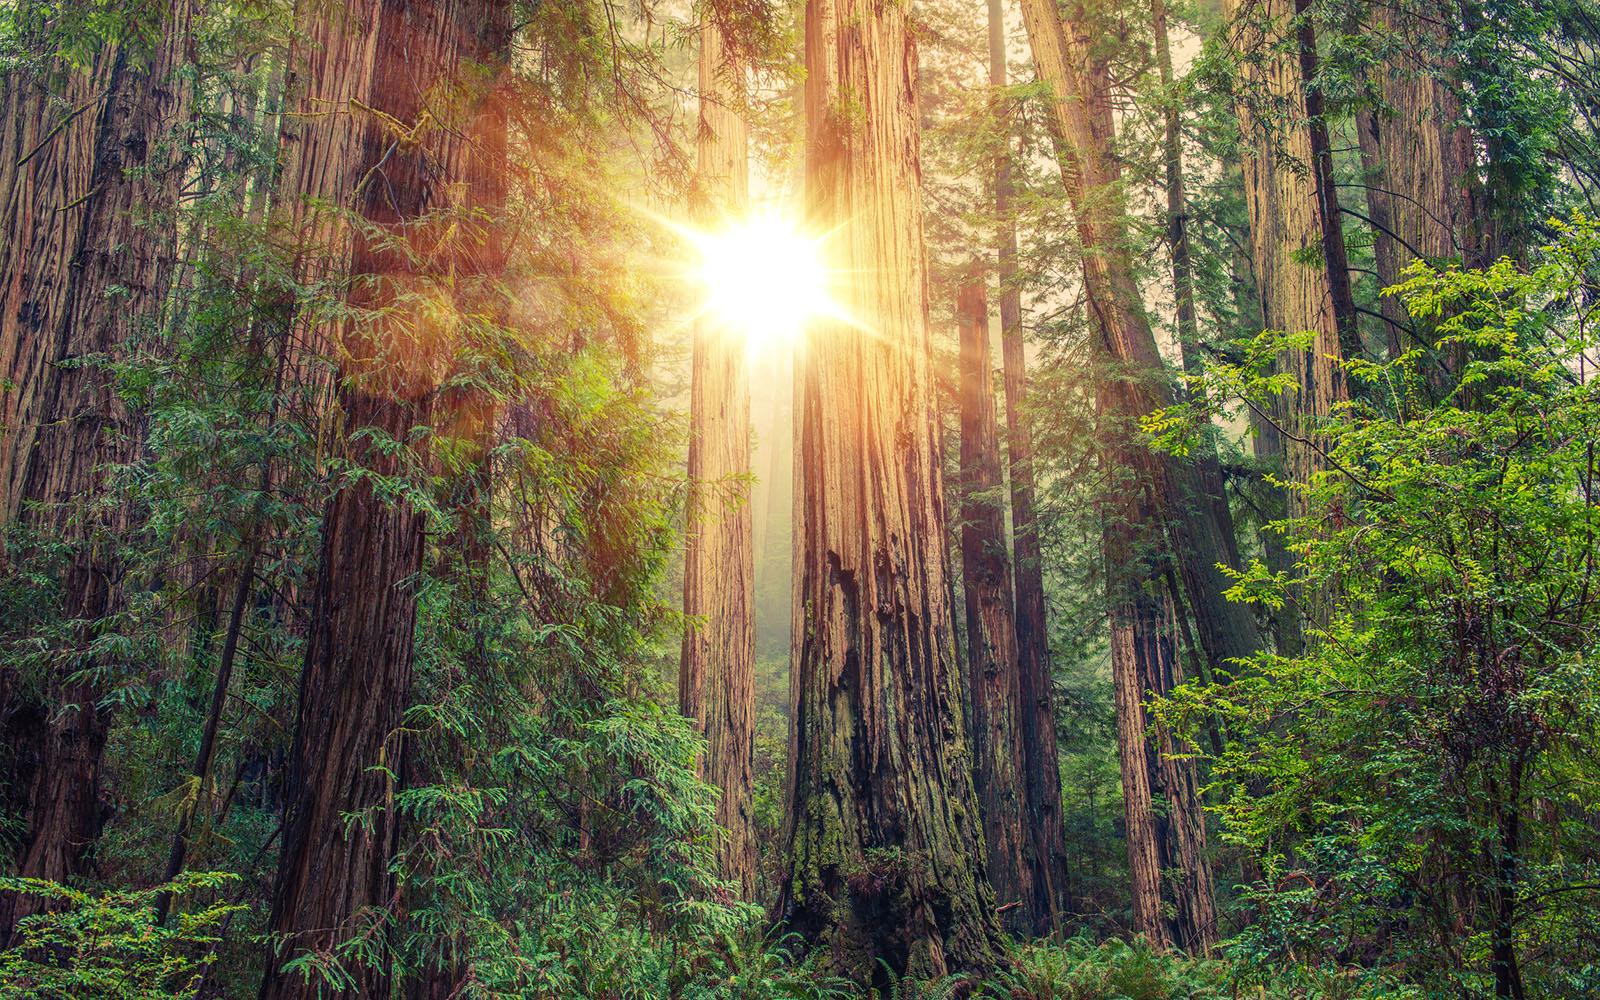 grove of Redwood tress with sun shining through